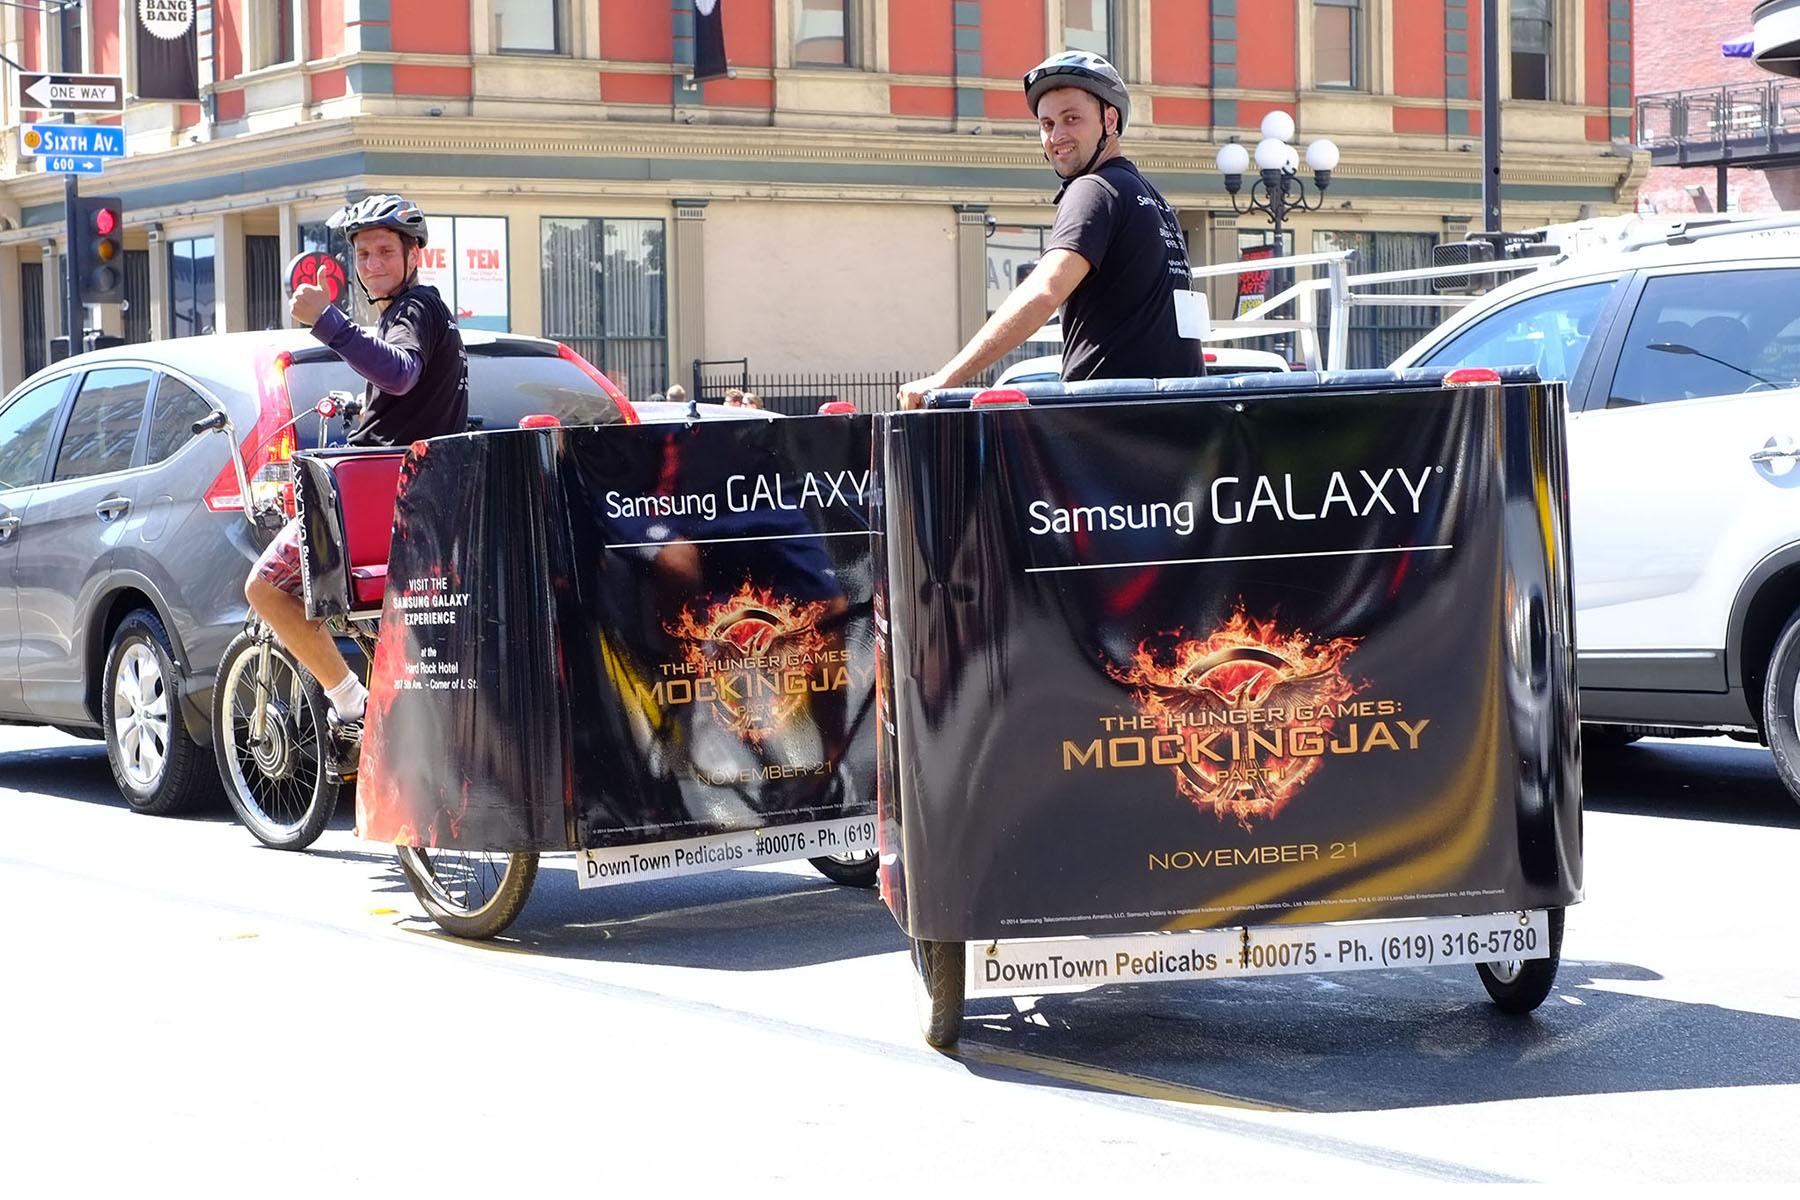 Samsung Galaxy branded pedicabs